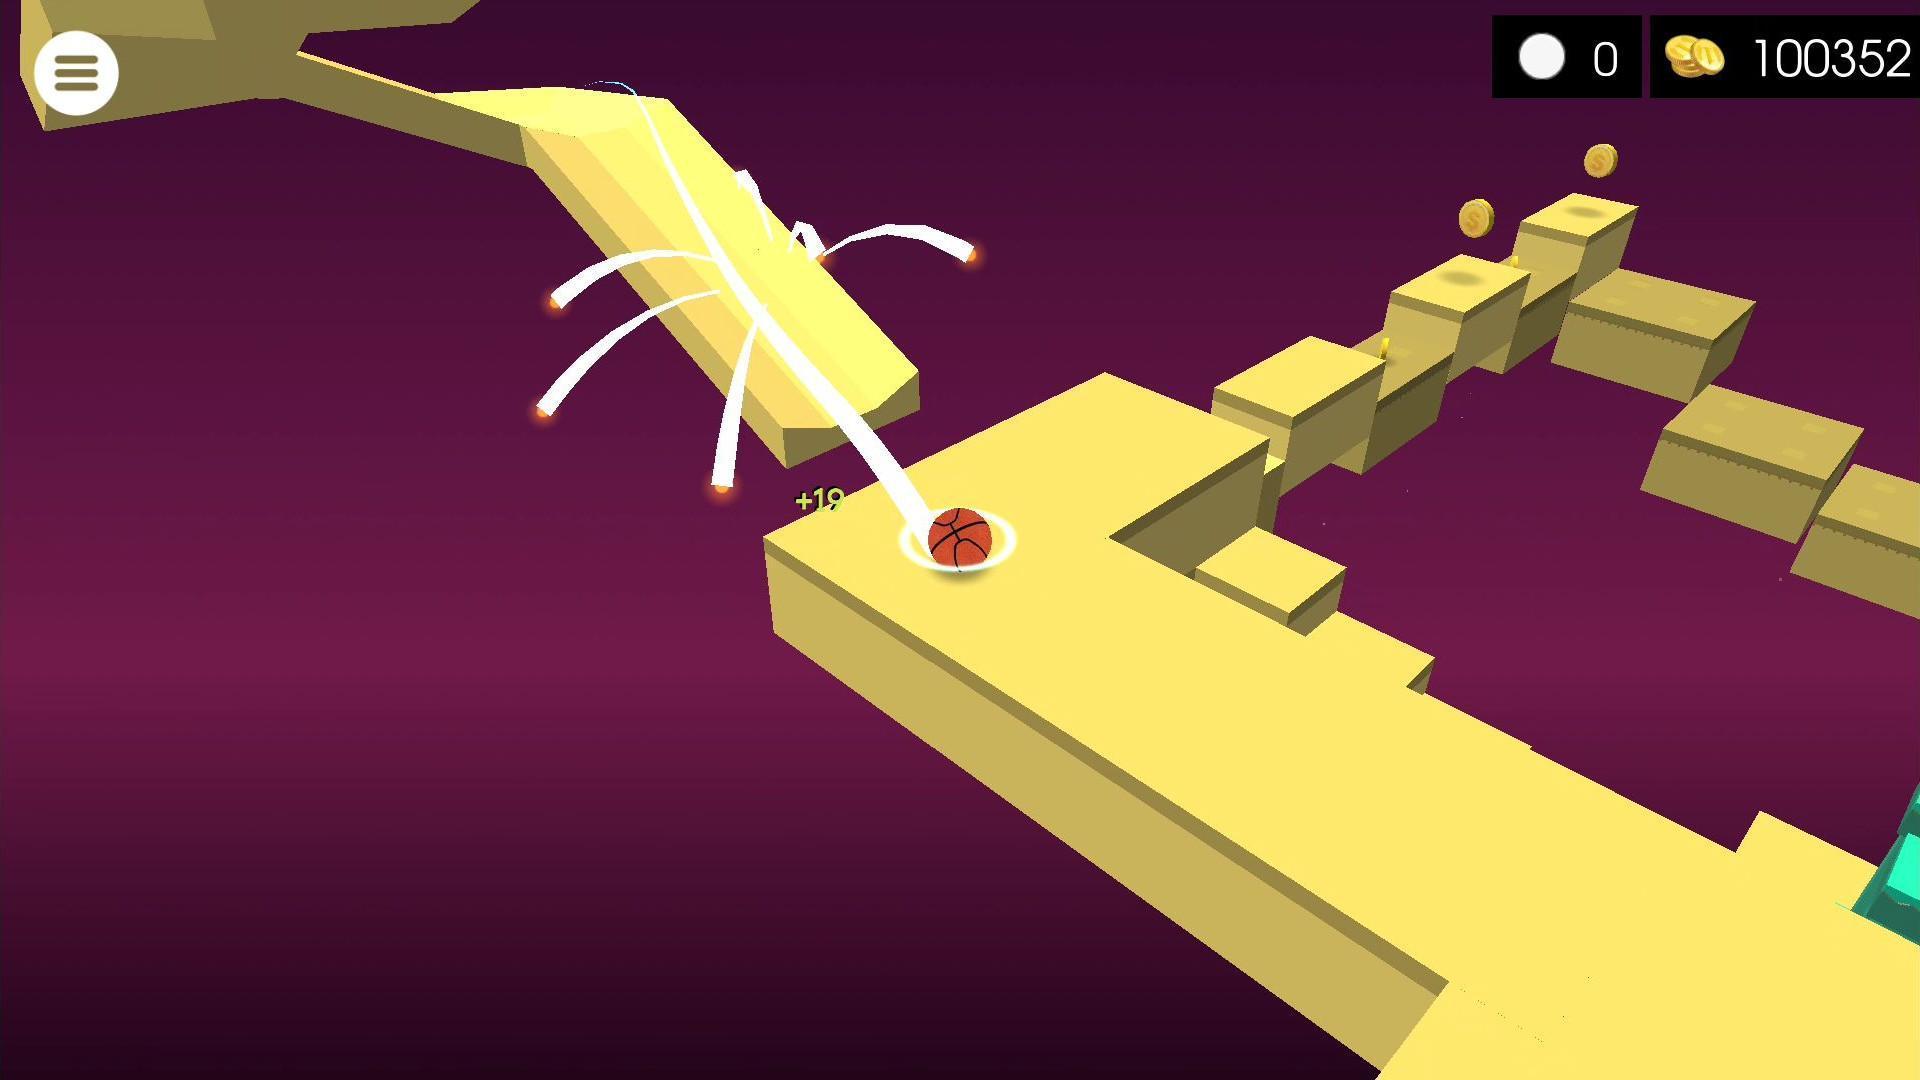 RYWO free 3D roll ball game 1.2.3 Screenshot 13